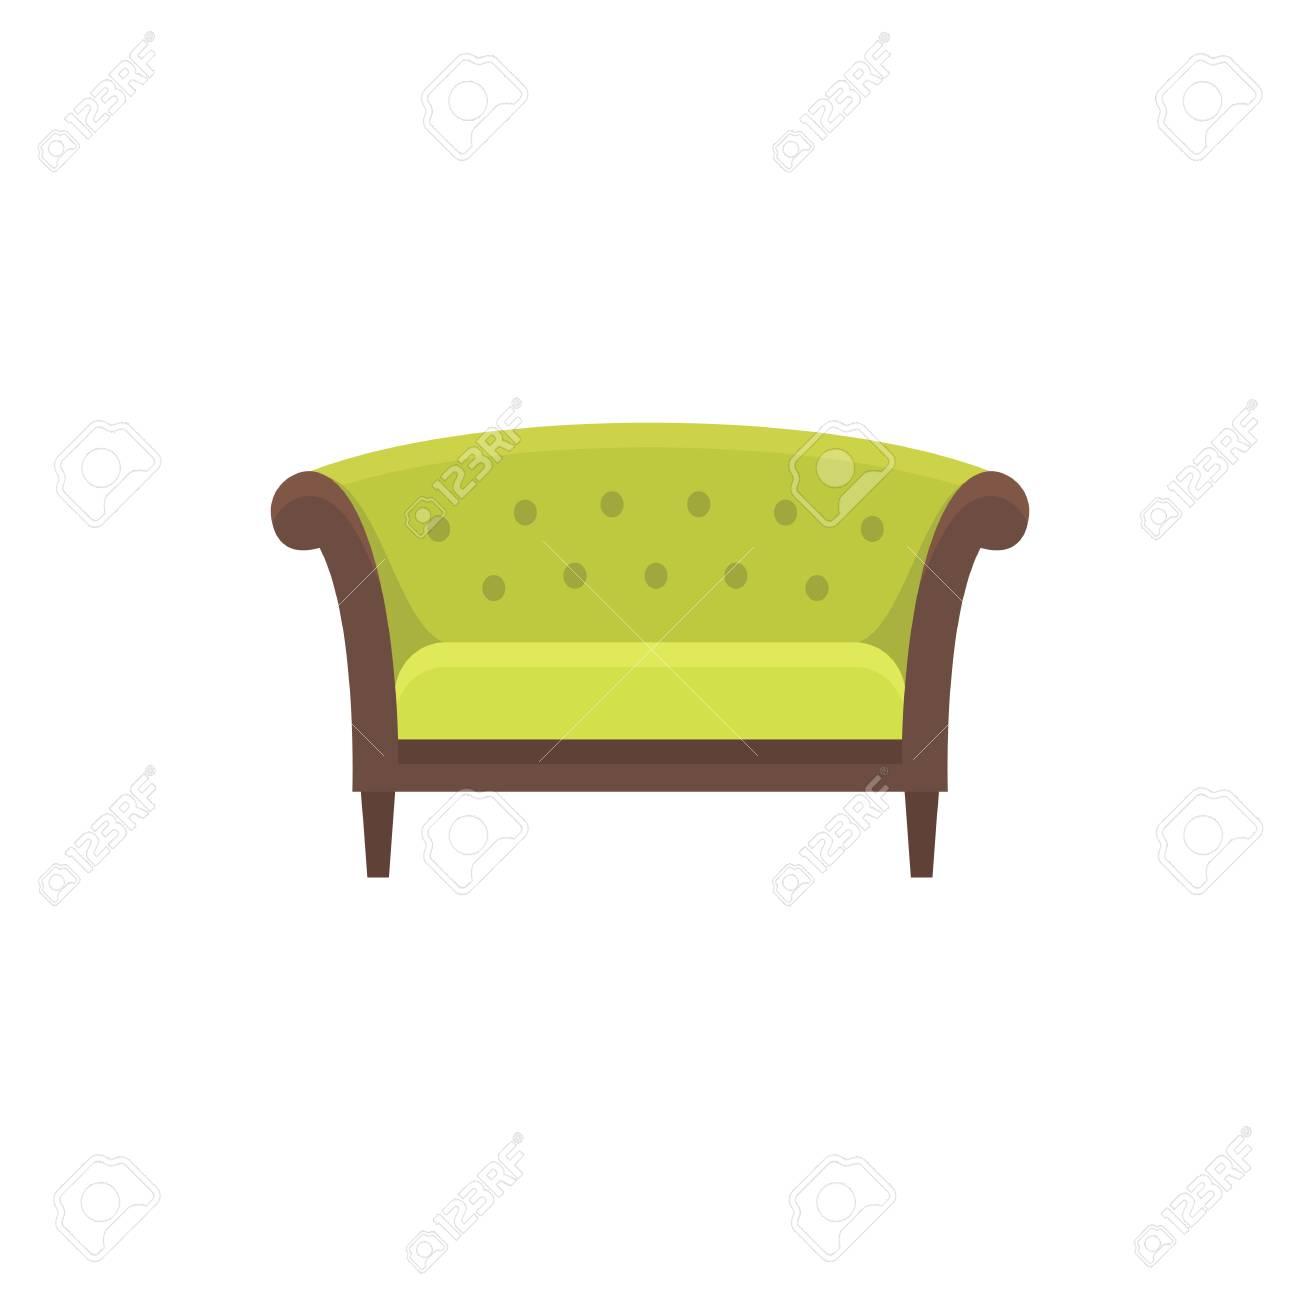 Green chesterfield sofa sofa. Vector illustration. Flat icon..